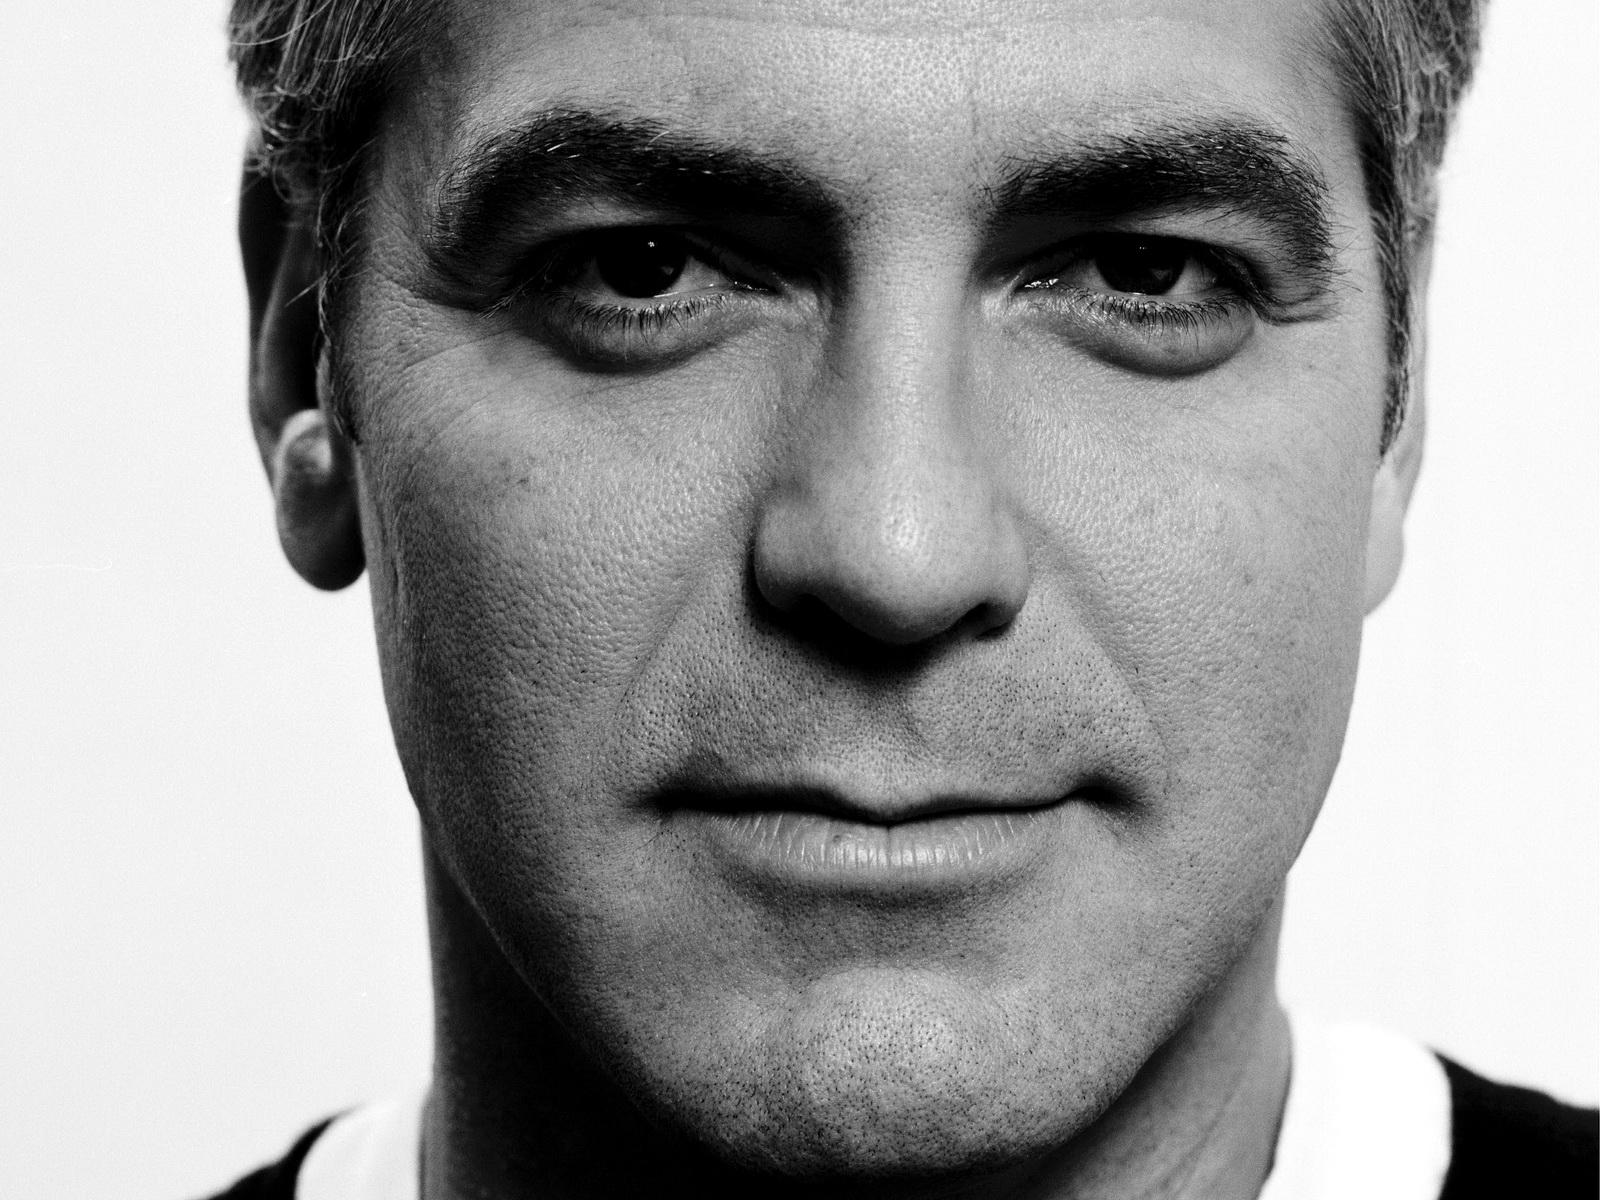 http://2.bp.blogspot.com/-LvaYfFFgq14/T1v6WMhHDrI/AAAAAAAAAIc/Ynw3-vjorVg/s1600/George-Clooney-2-16001.jpg